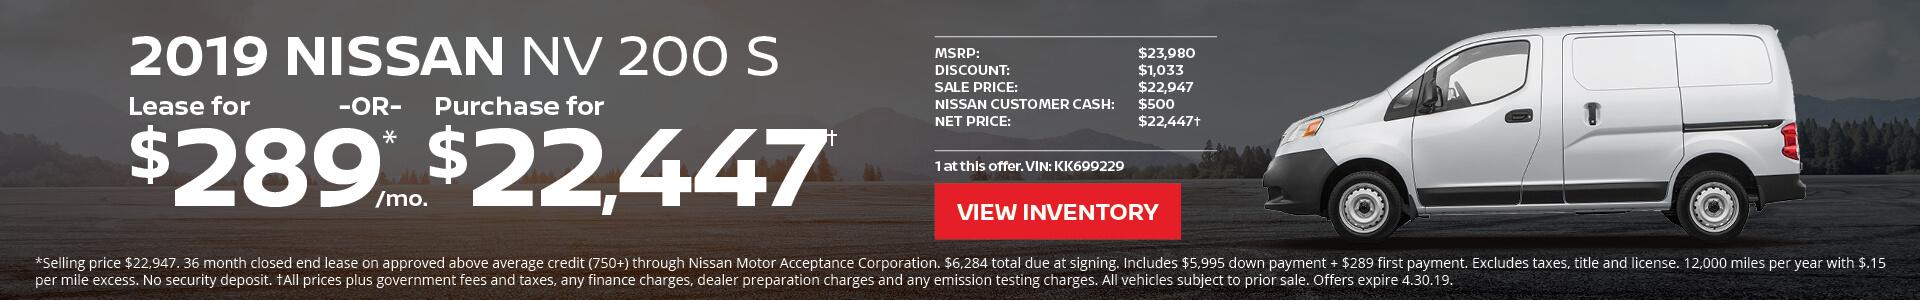 Nissan NV200 $289 Lease